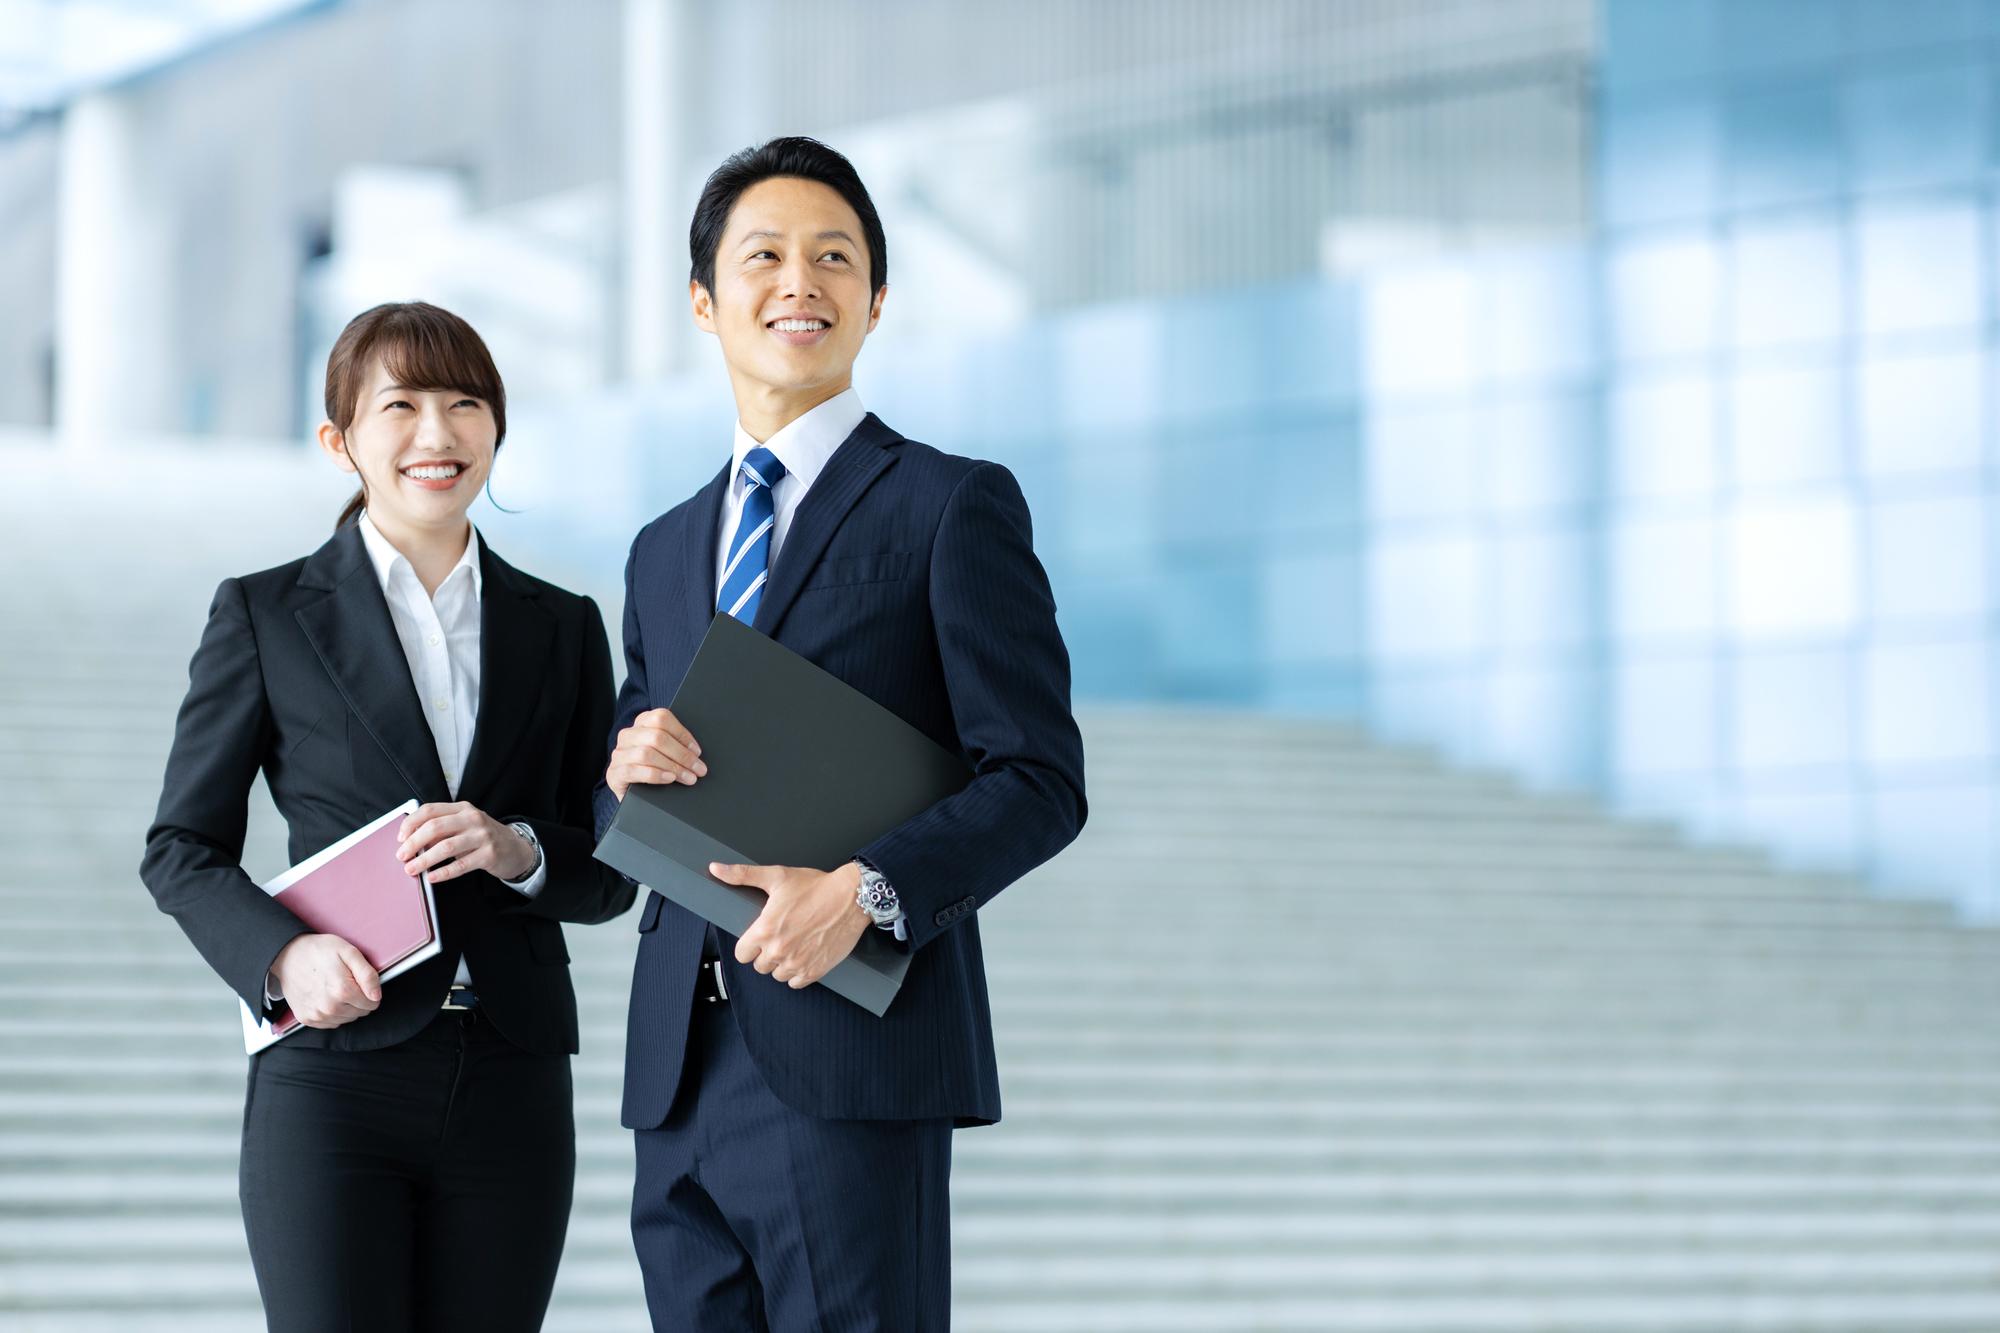 SEに転職するための秘訣とは?成功率を高める方法から社内SE・社外SEの違いまで徹底解説